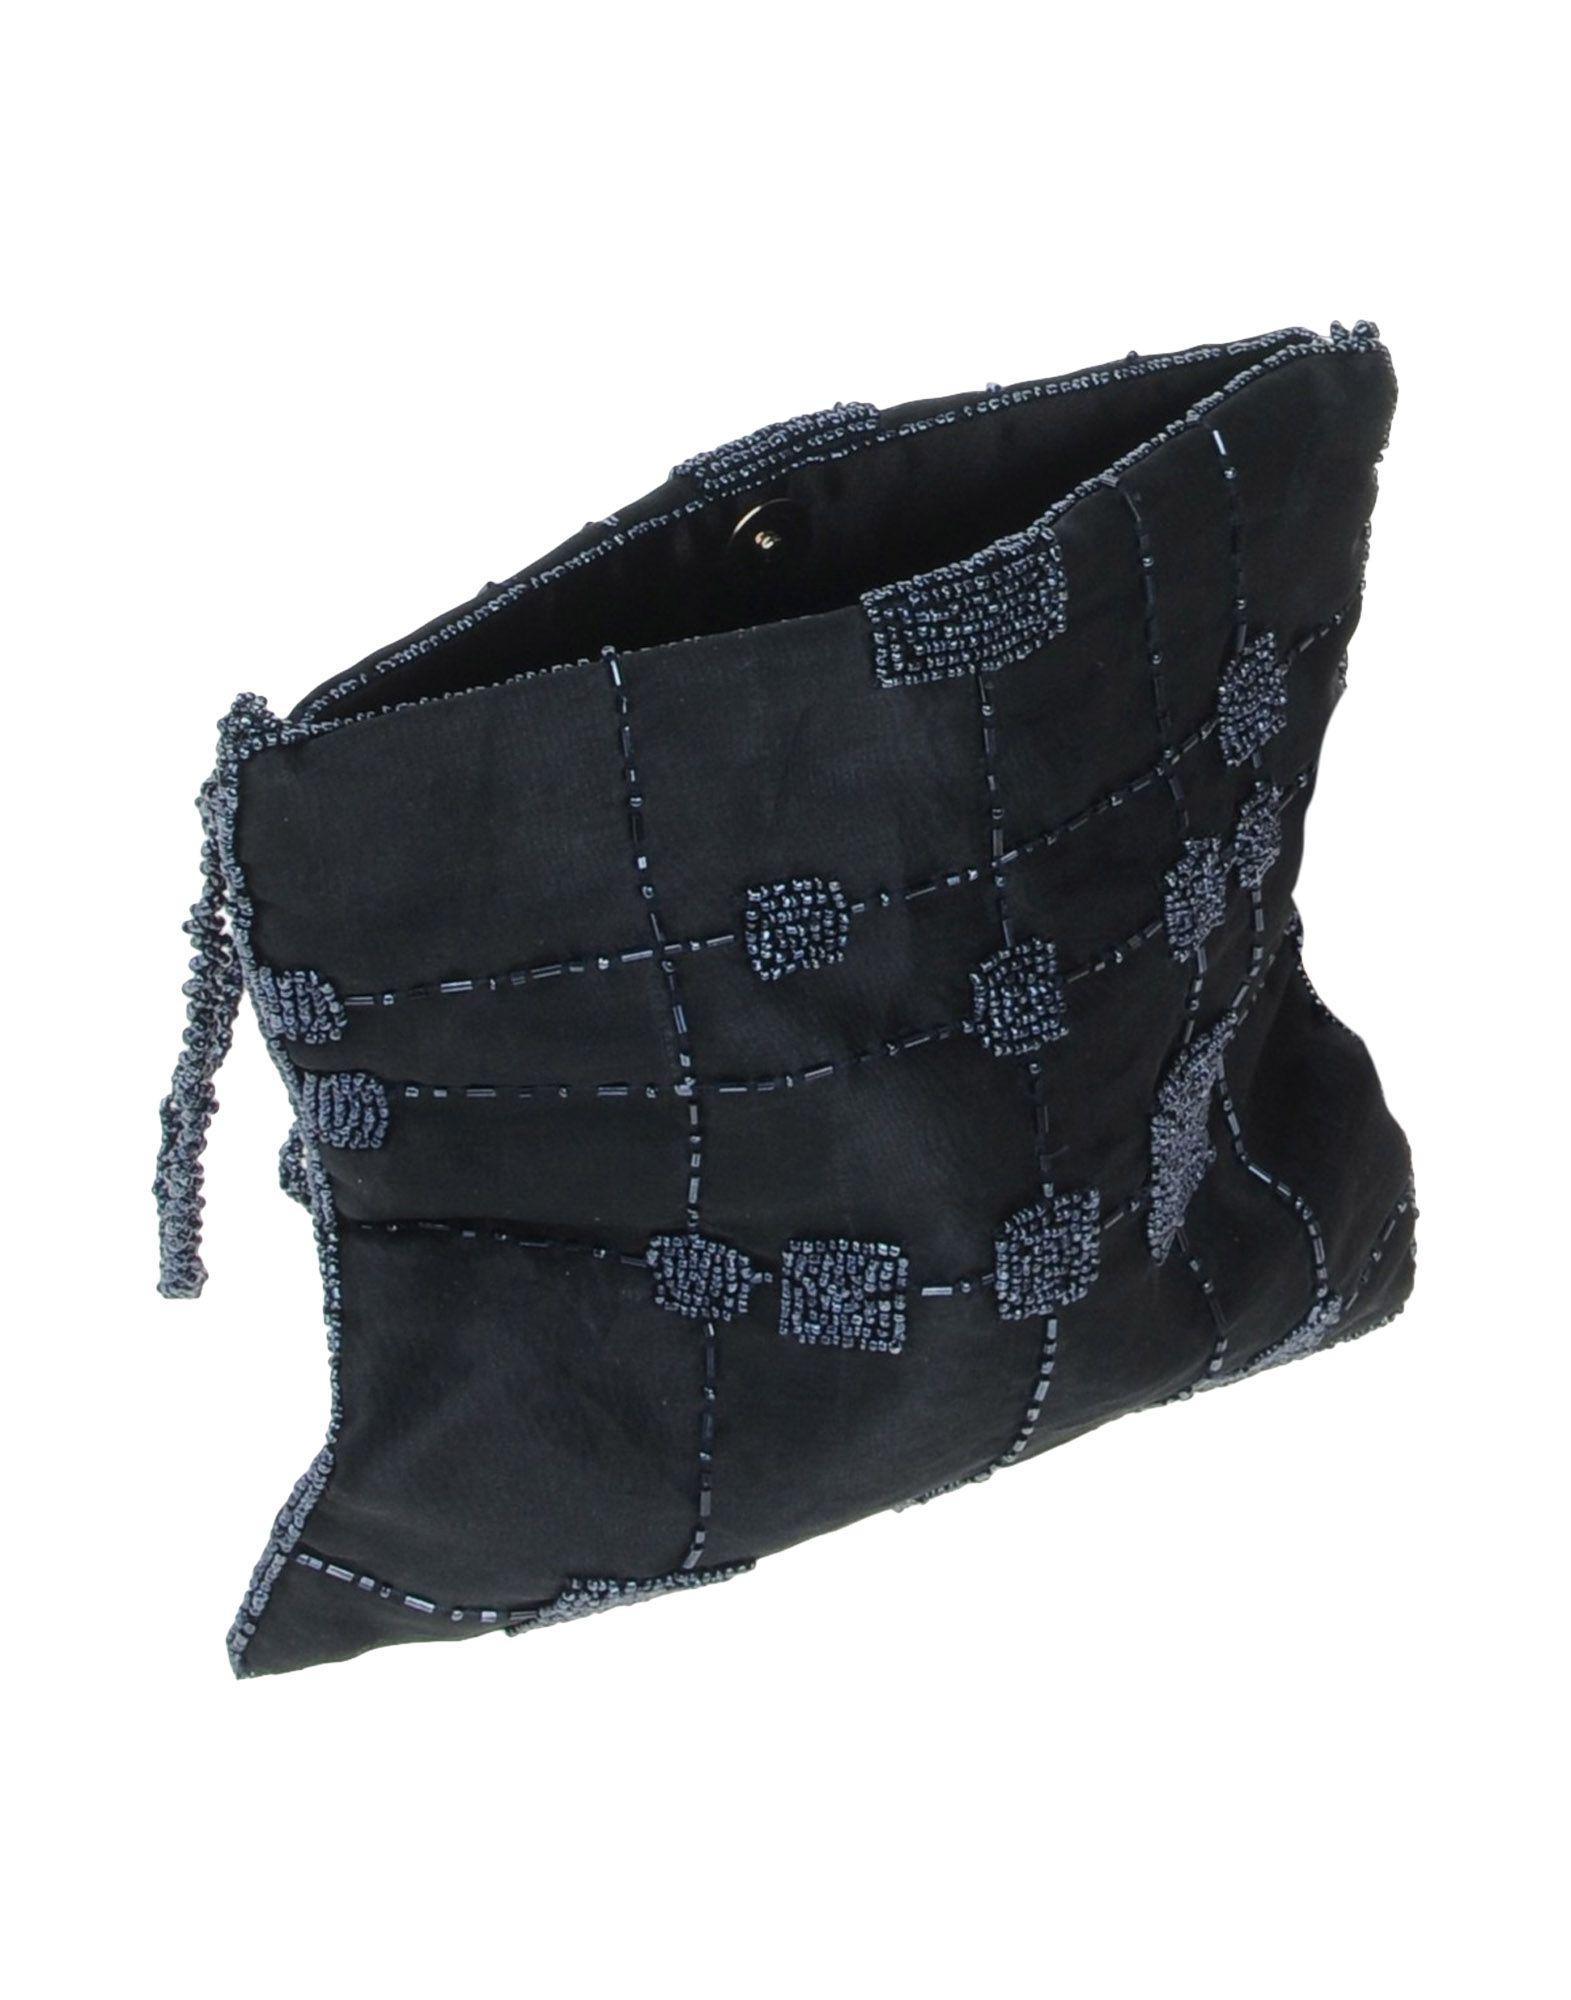 Caractere Satin Cross-body Bag in Dark Blue (Blue)